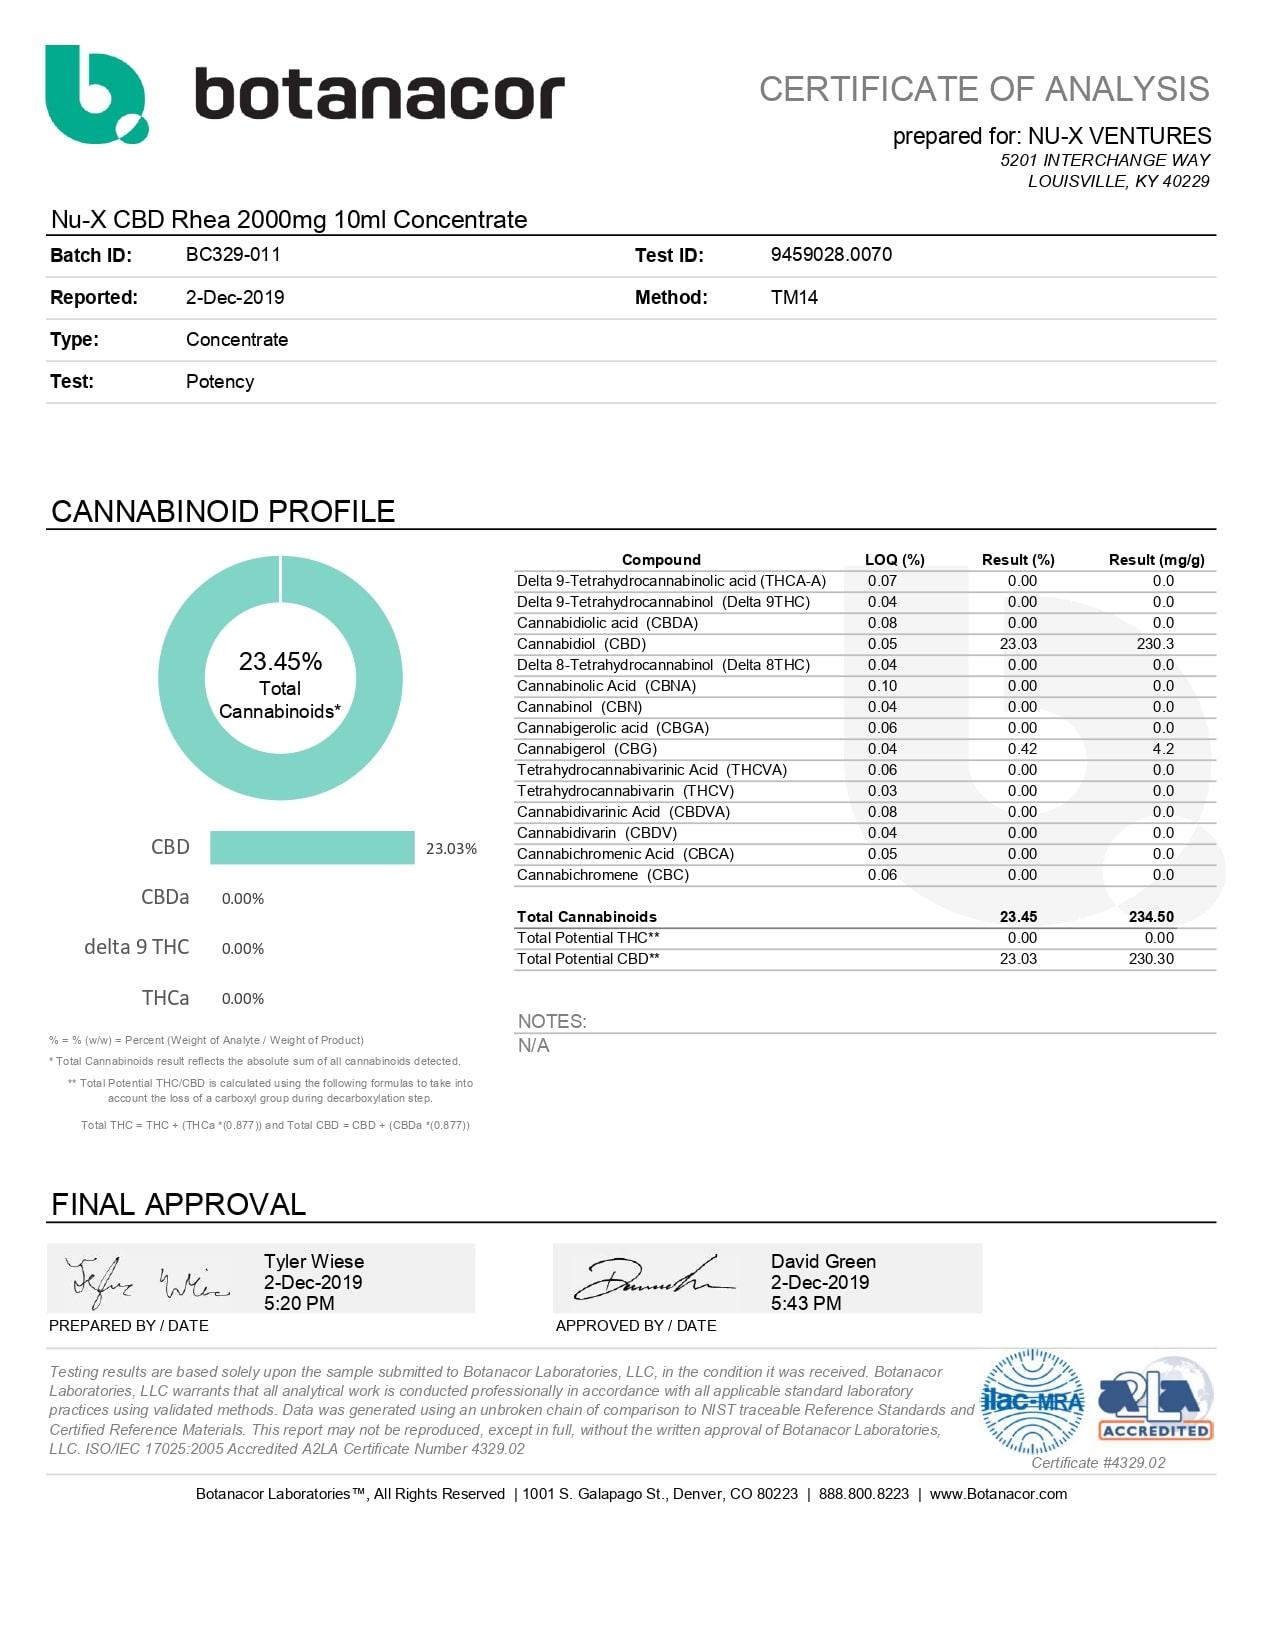 NU-X CBD eLiquid Concentrate Lab Report | Fruity - Rhea 2000mg